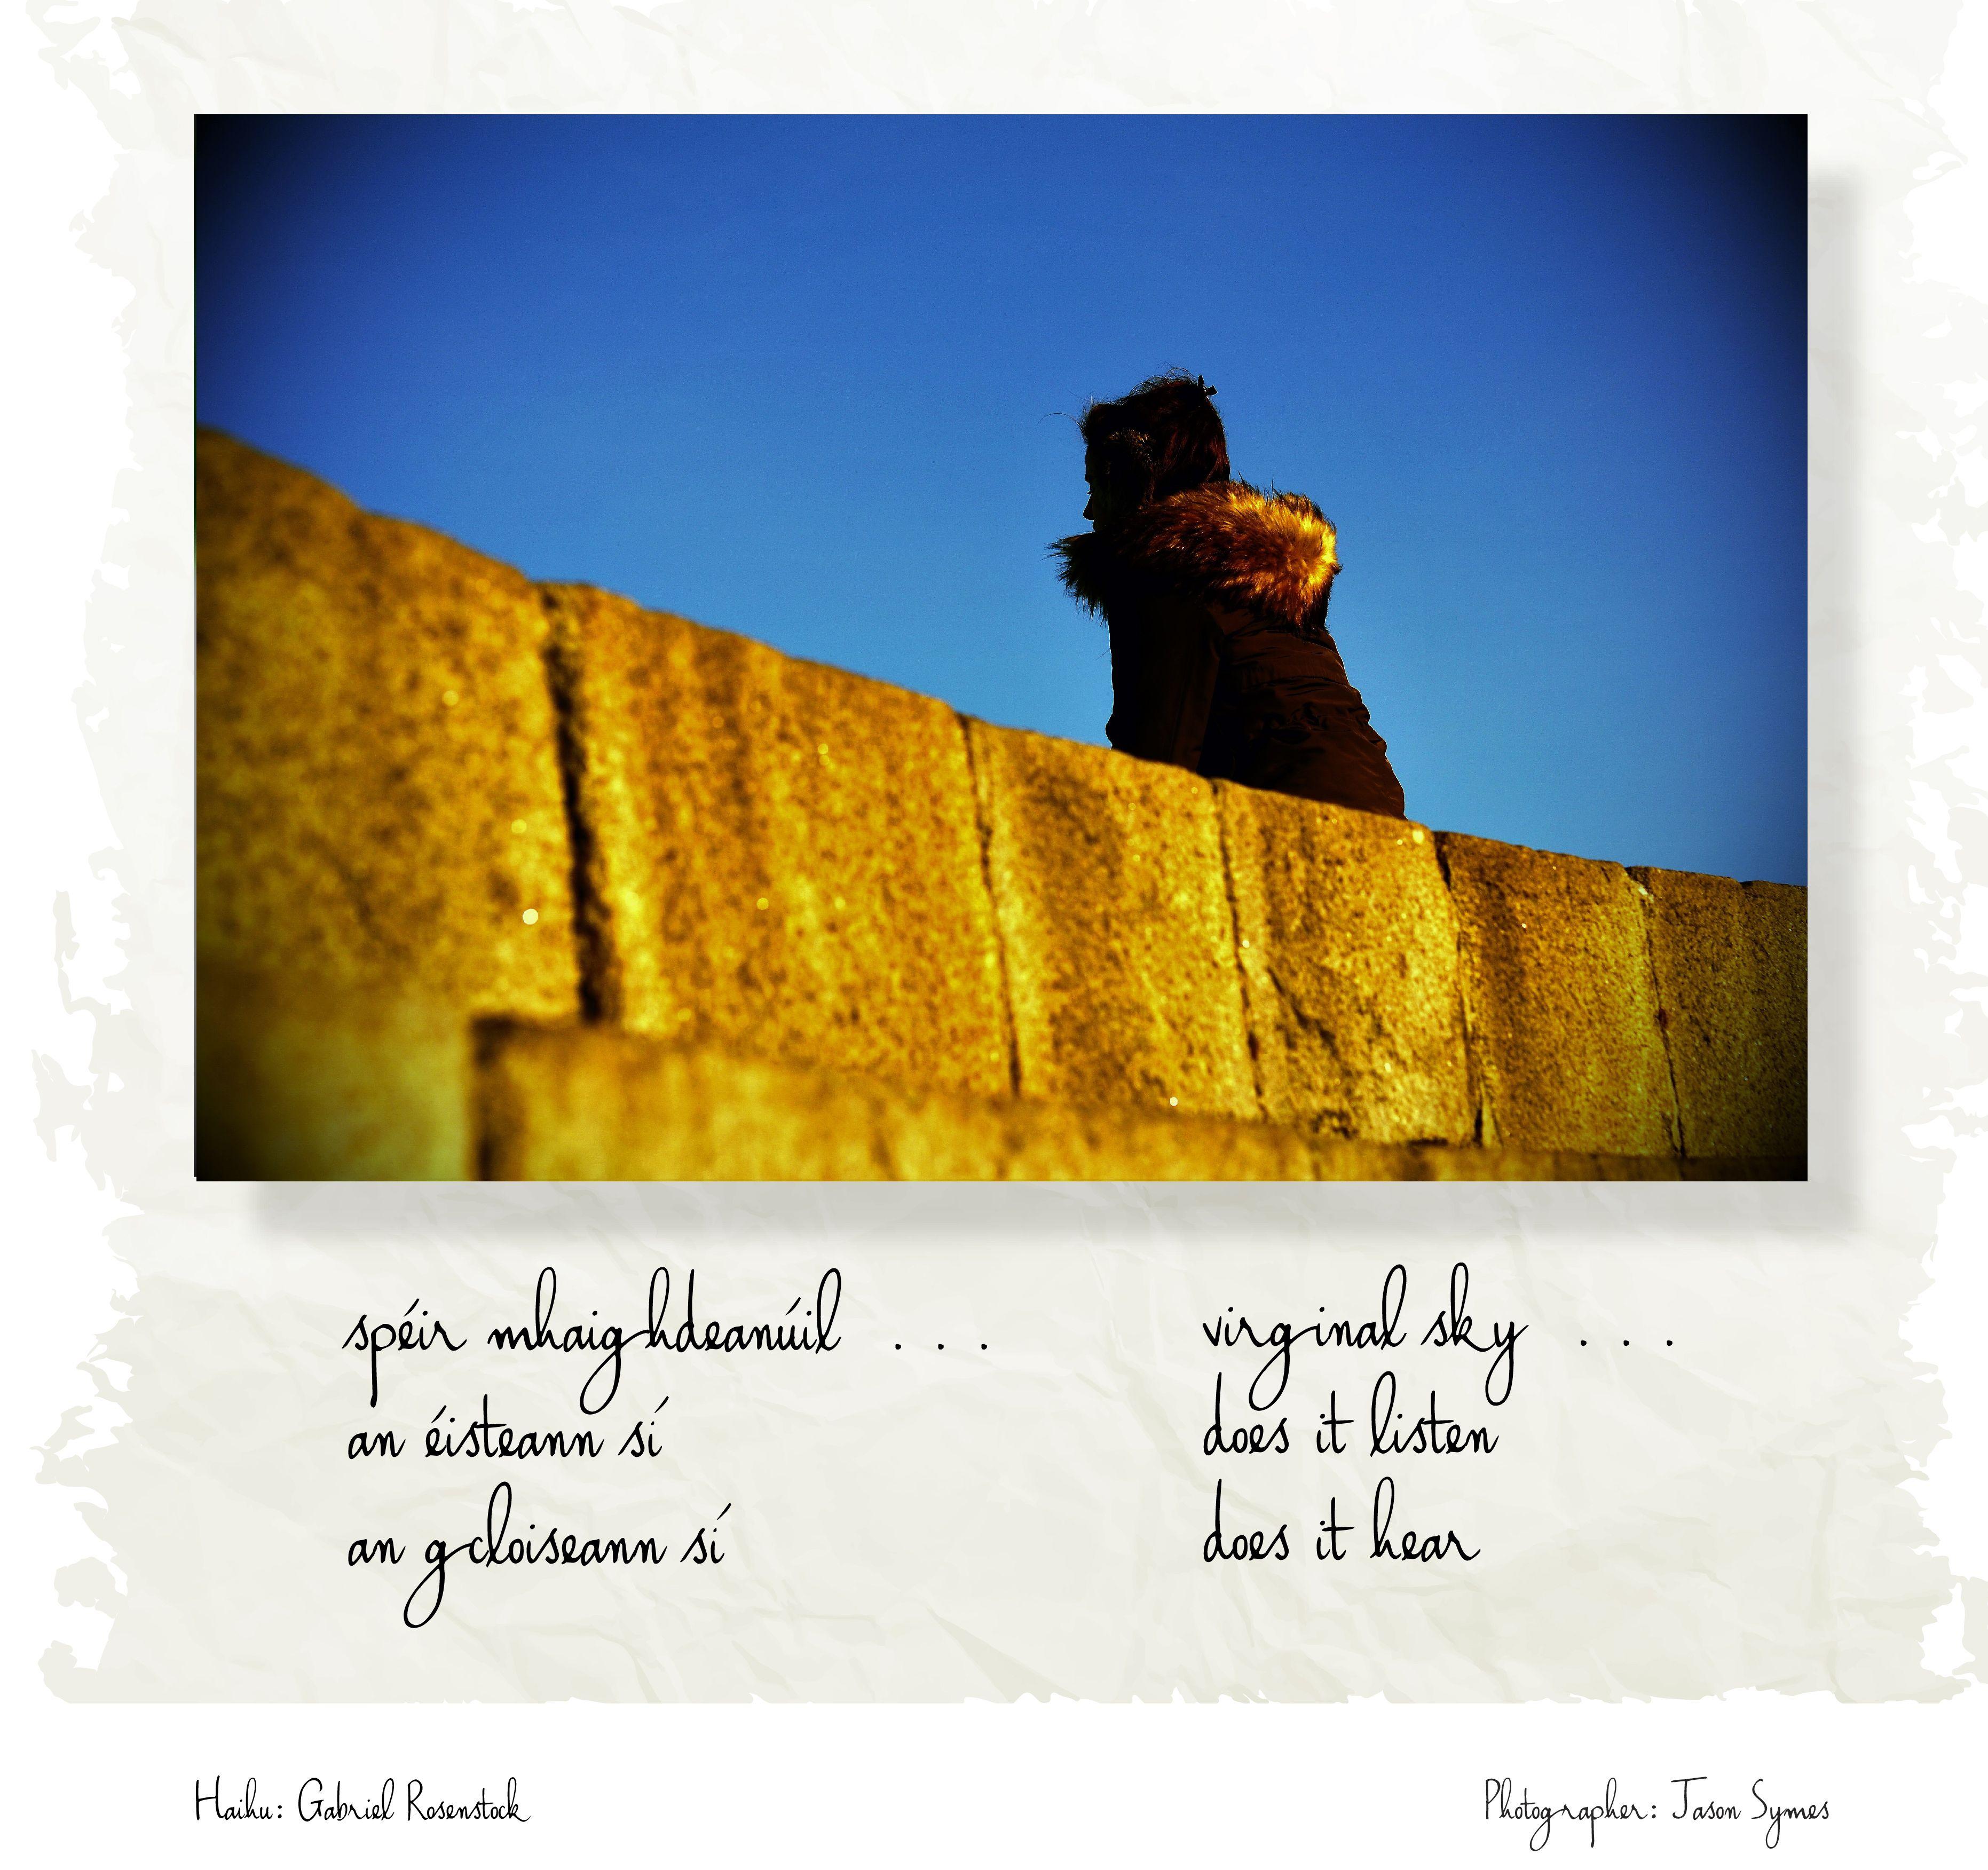 Pin by Haikusan on Haiku / Photography Irish language